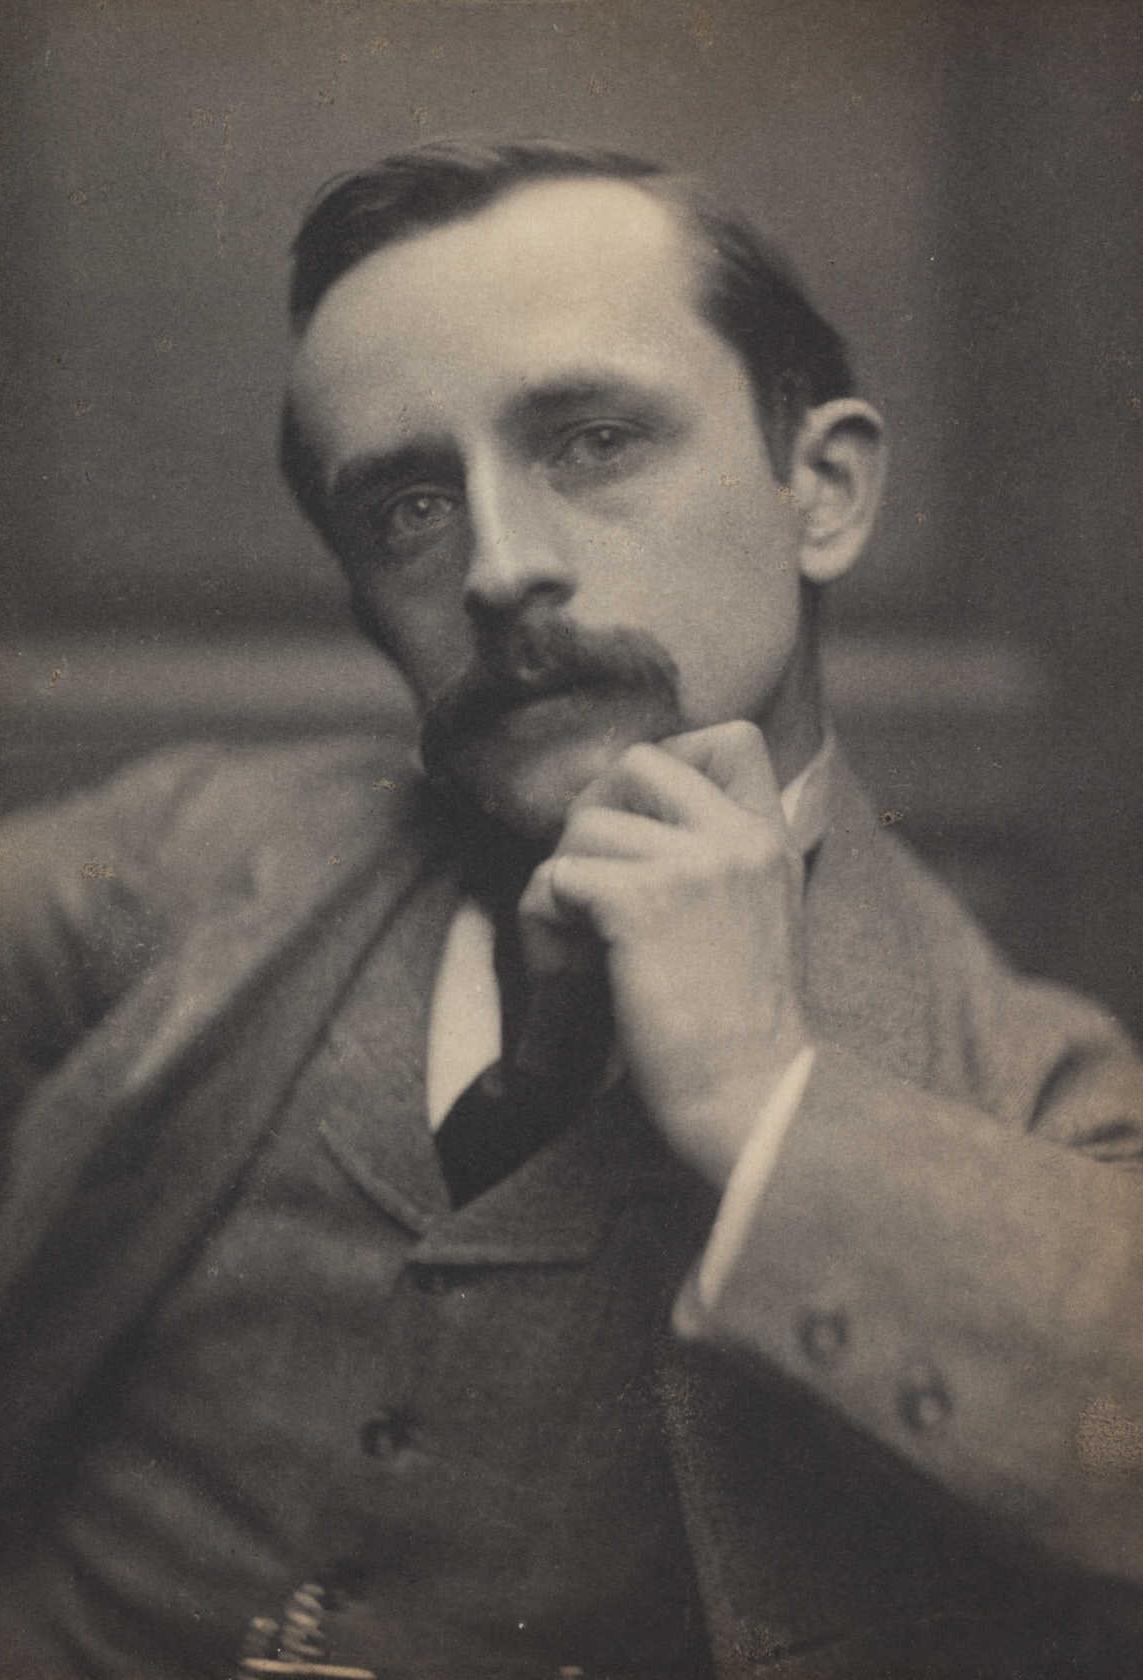 Description J. M. Barrie, 1892. (7893554540).jpg: commons.wikimedia.org/wiki/File:J._M._Barrie,_1892._(7893554540).jpg